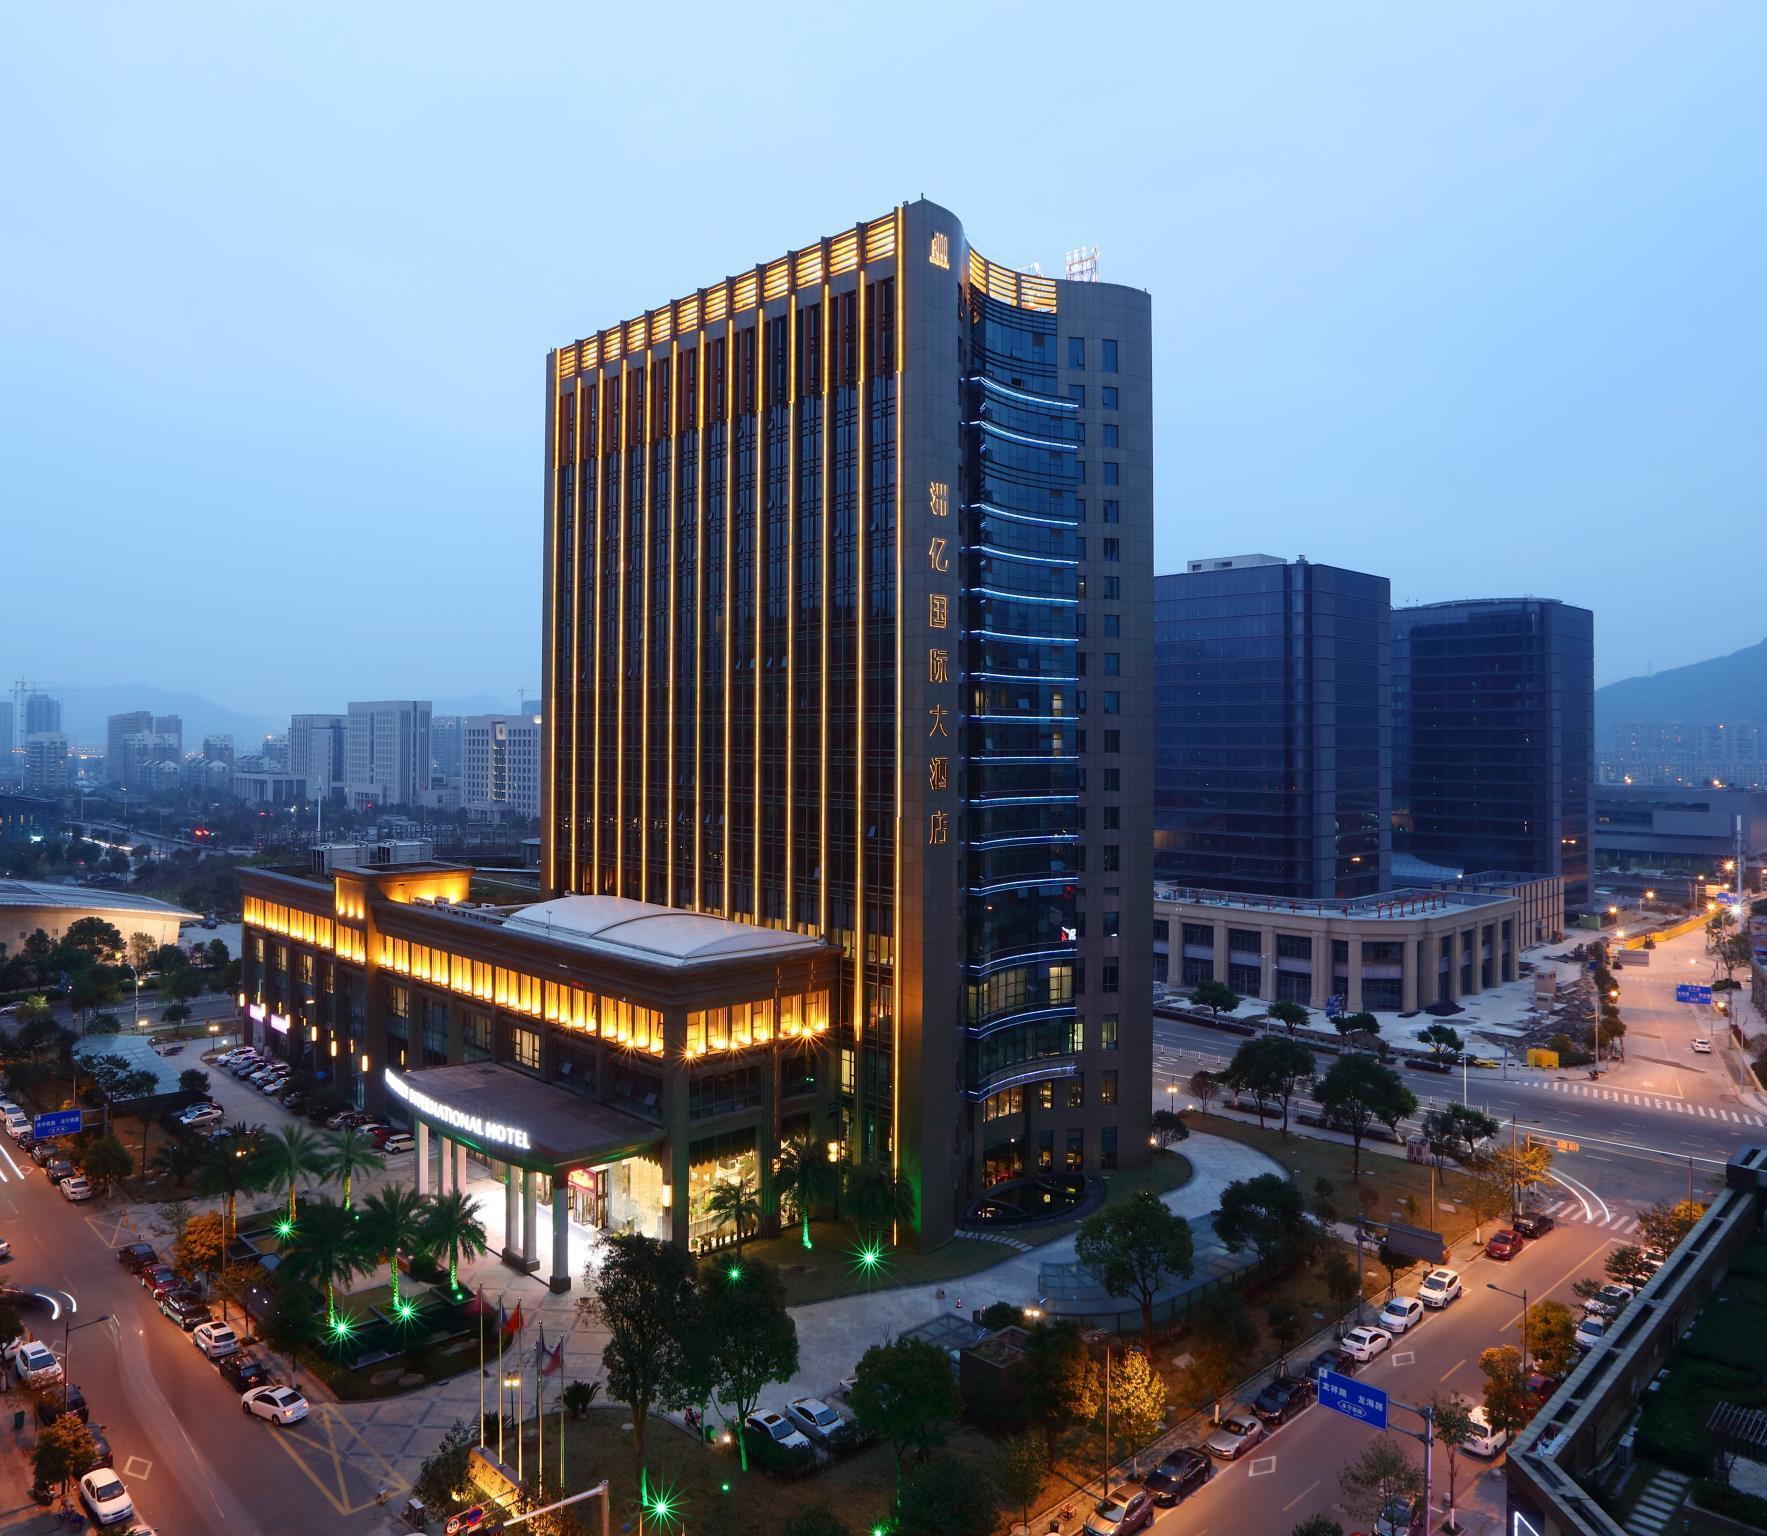 Chouery International Hotel